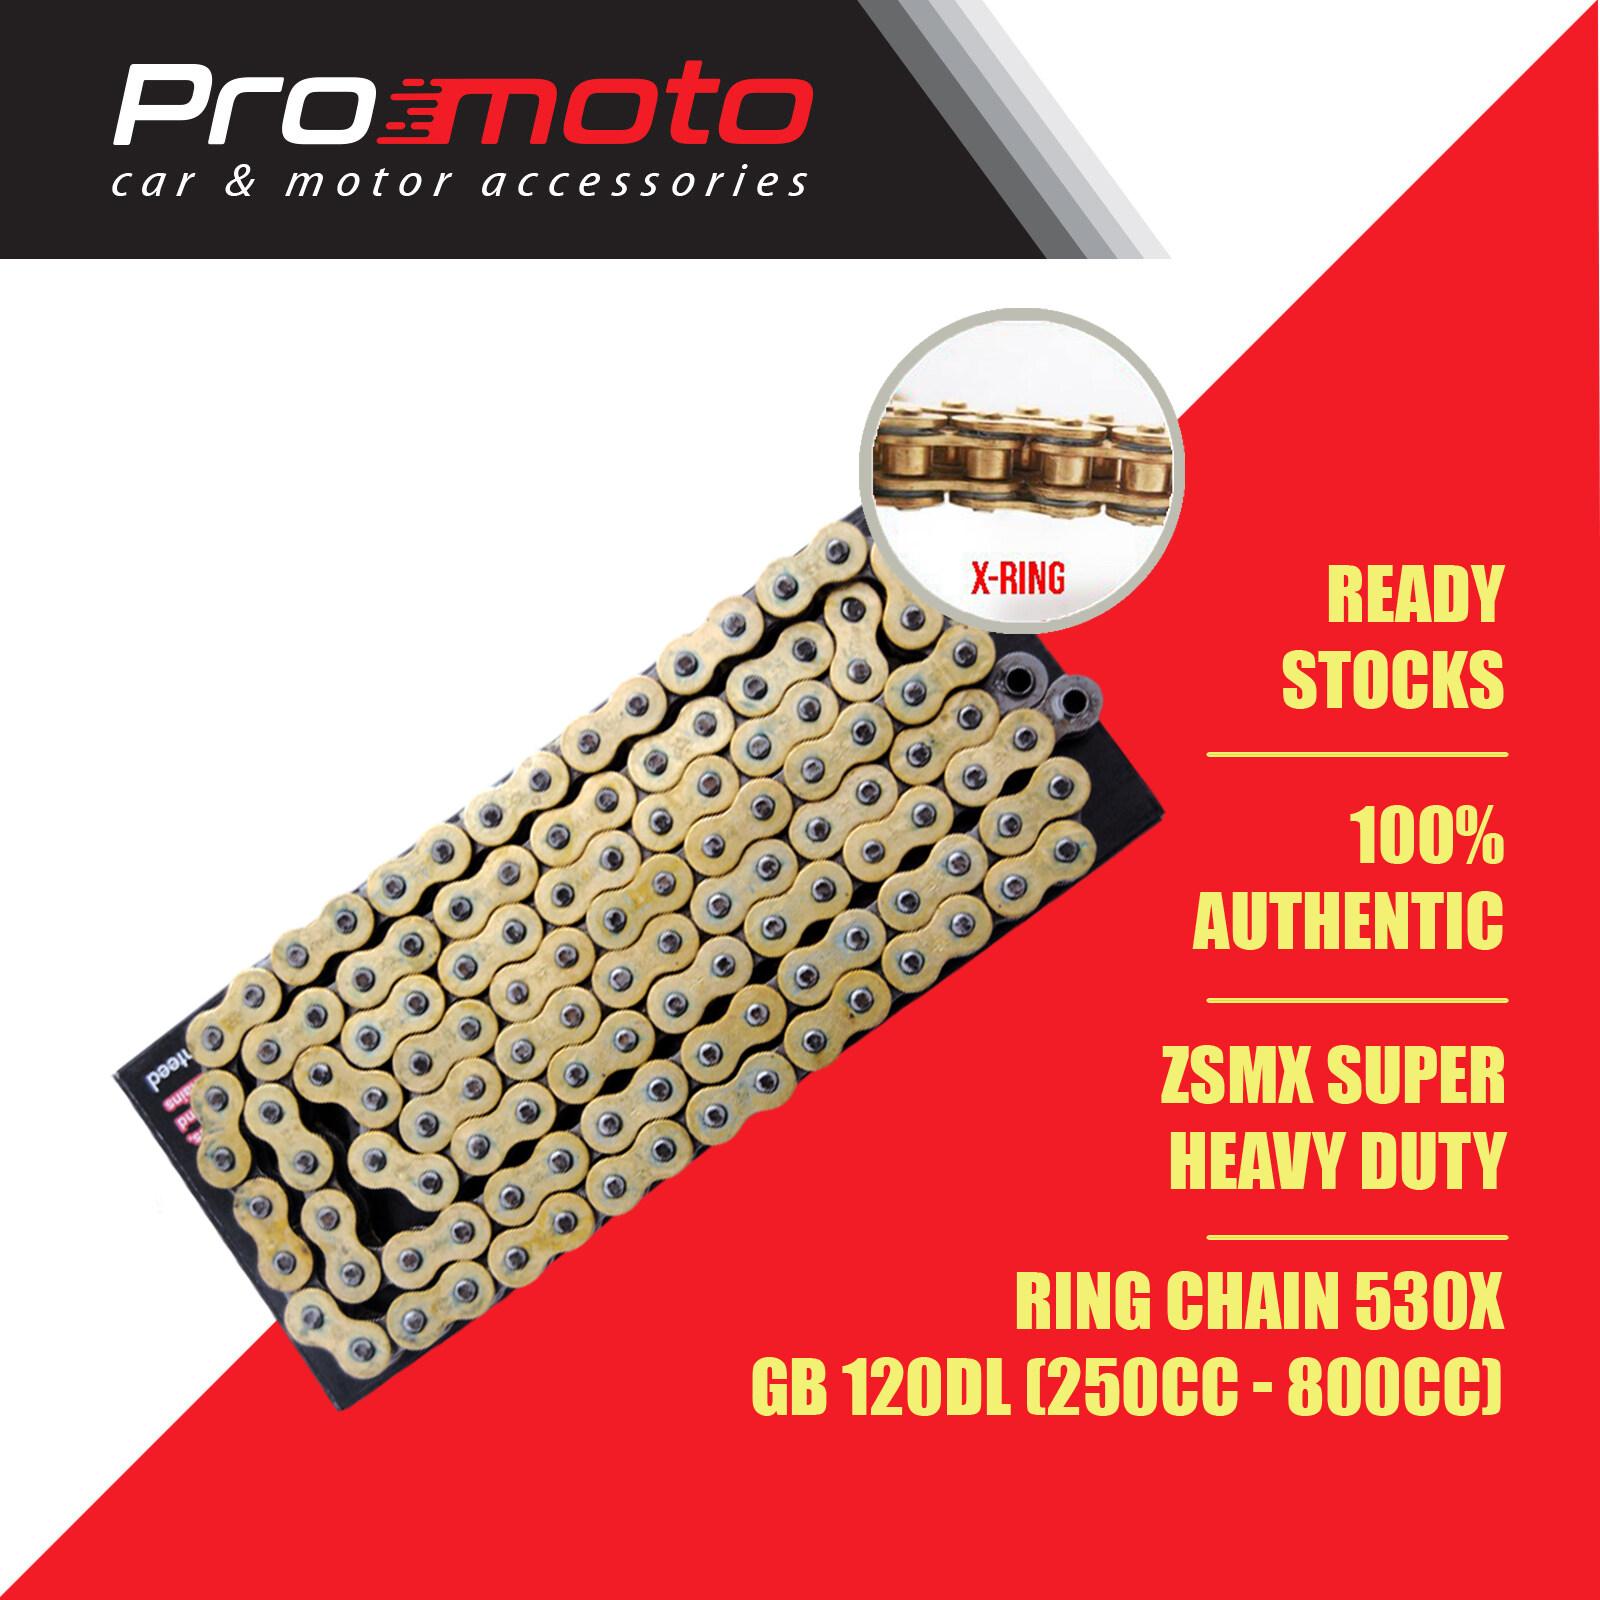 Jomthai 530 X RING Chain ZSMX (Super Heavy Duty) GB 120DL 250cc - 800cc